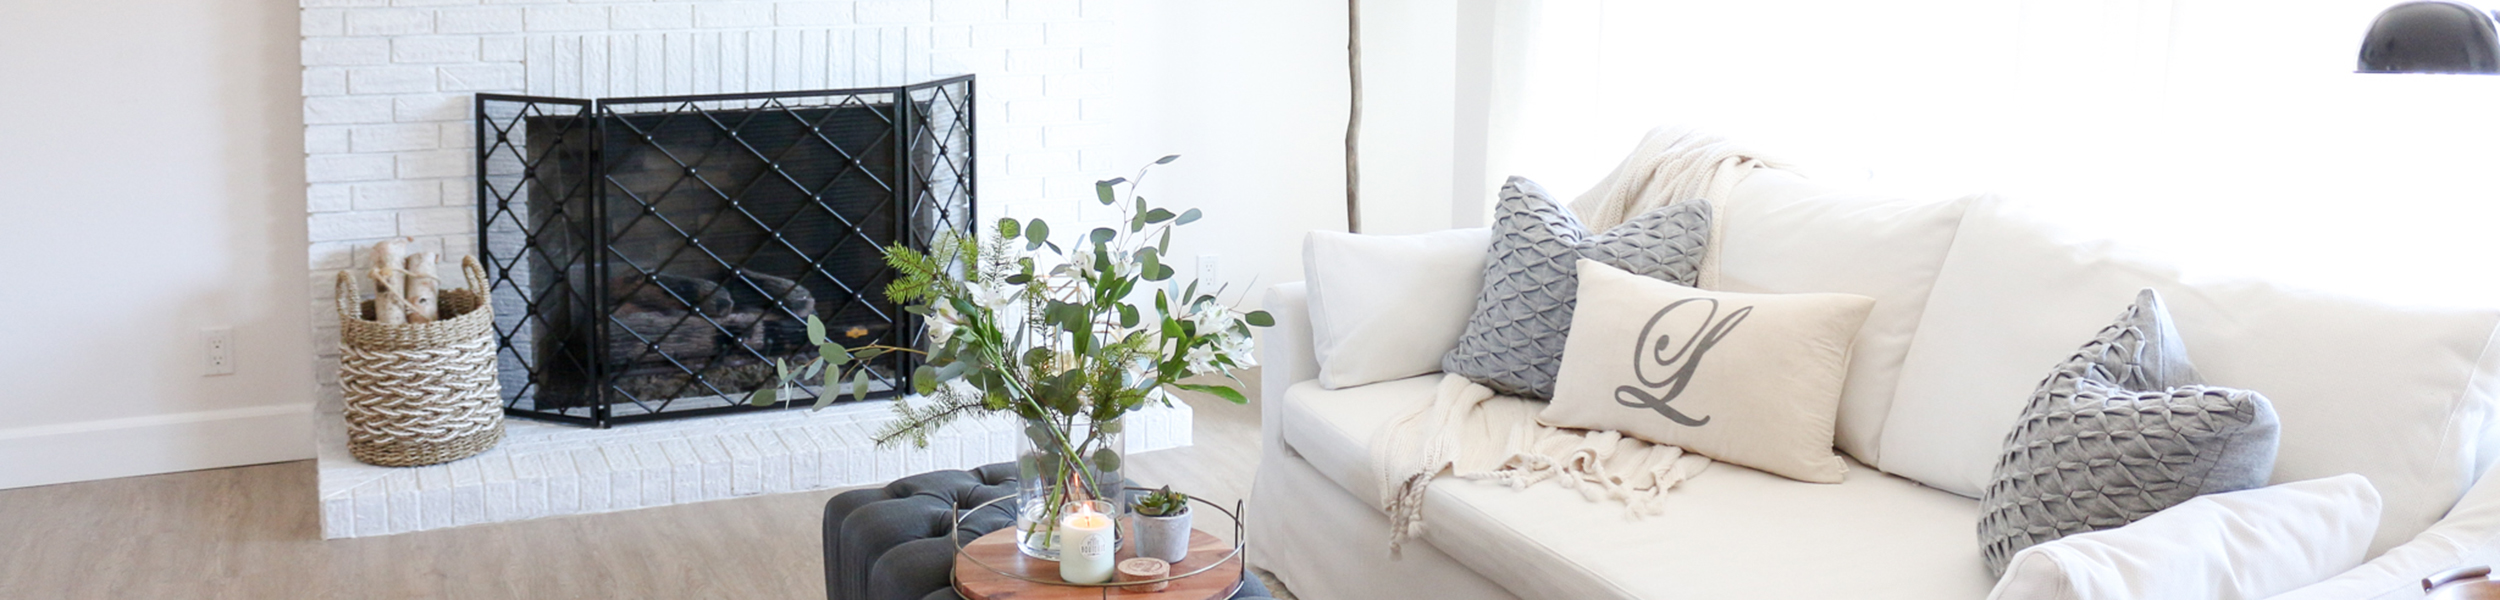 cozy-living-room-hygge-1111lightlane11